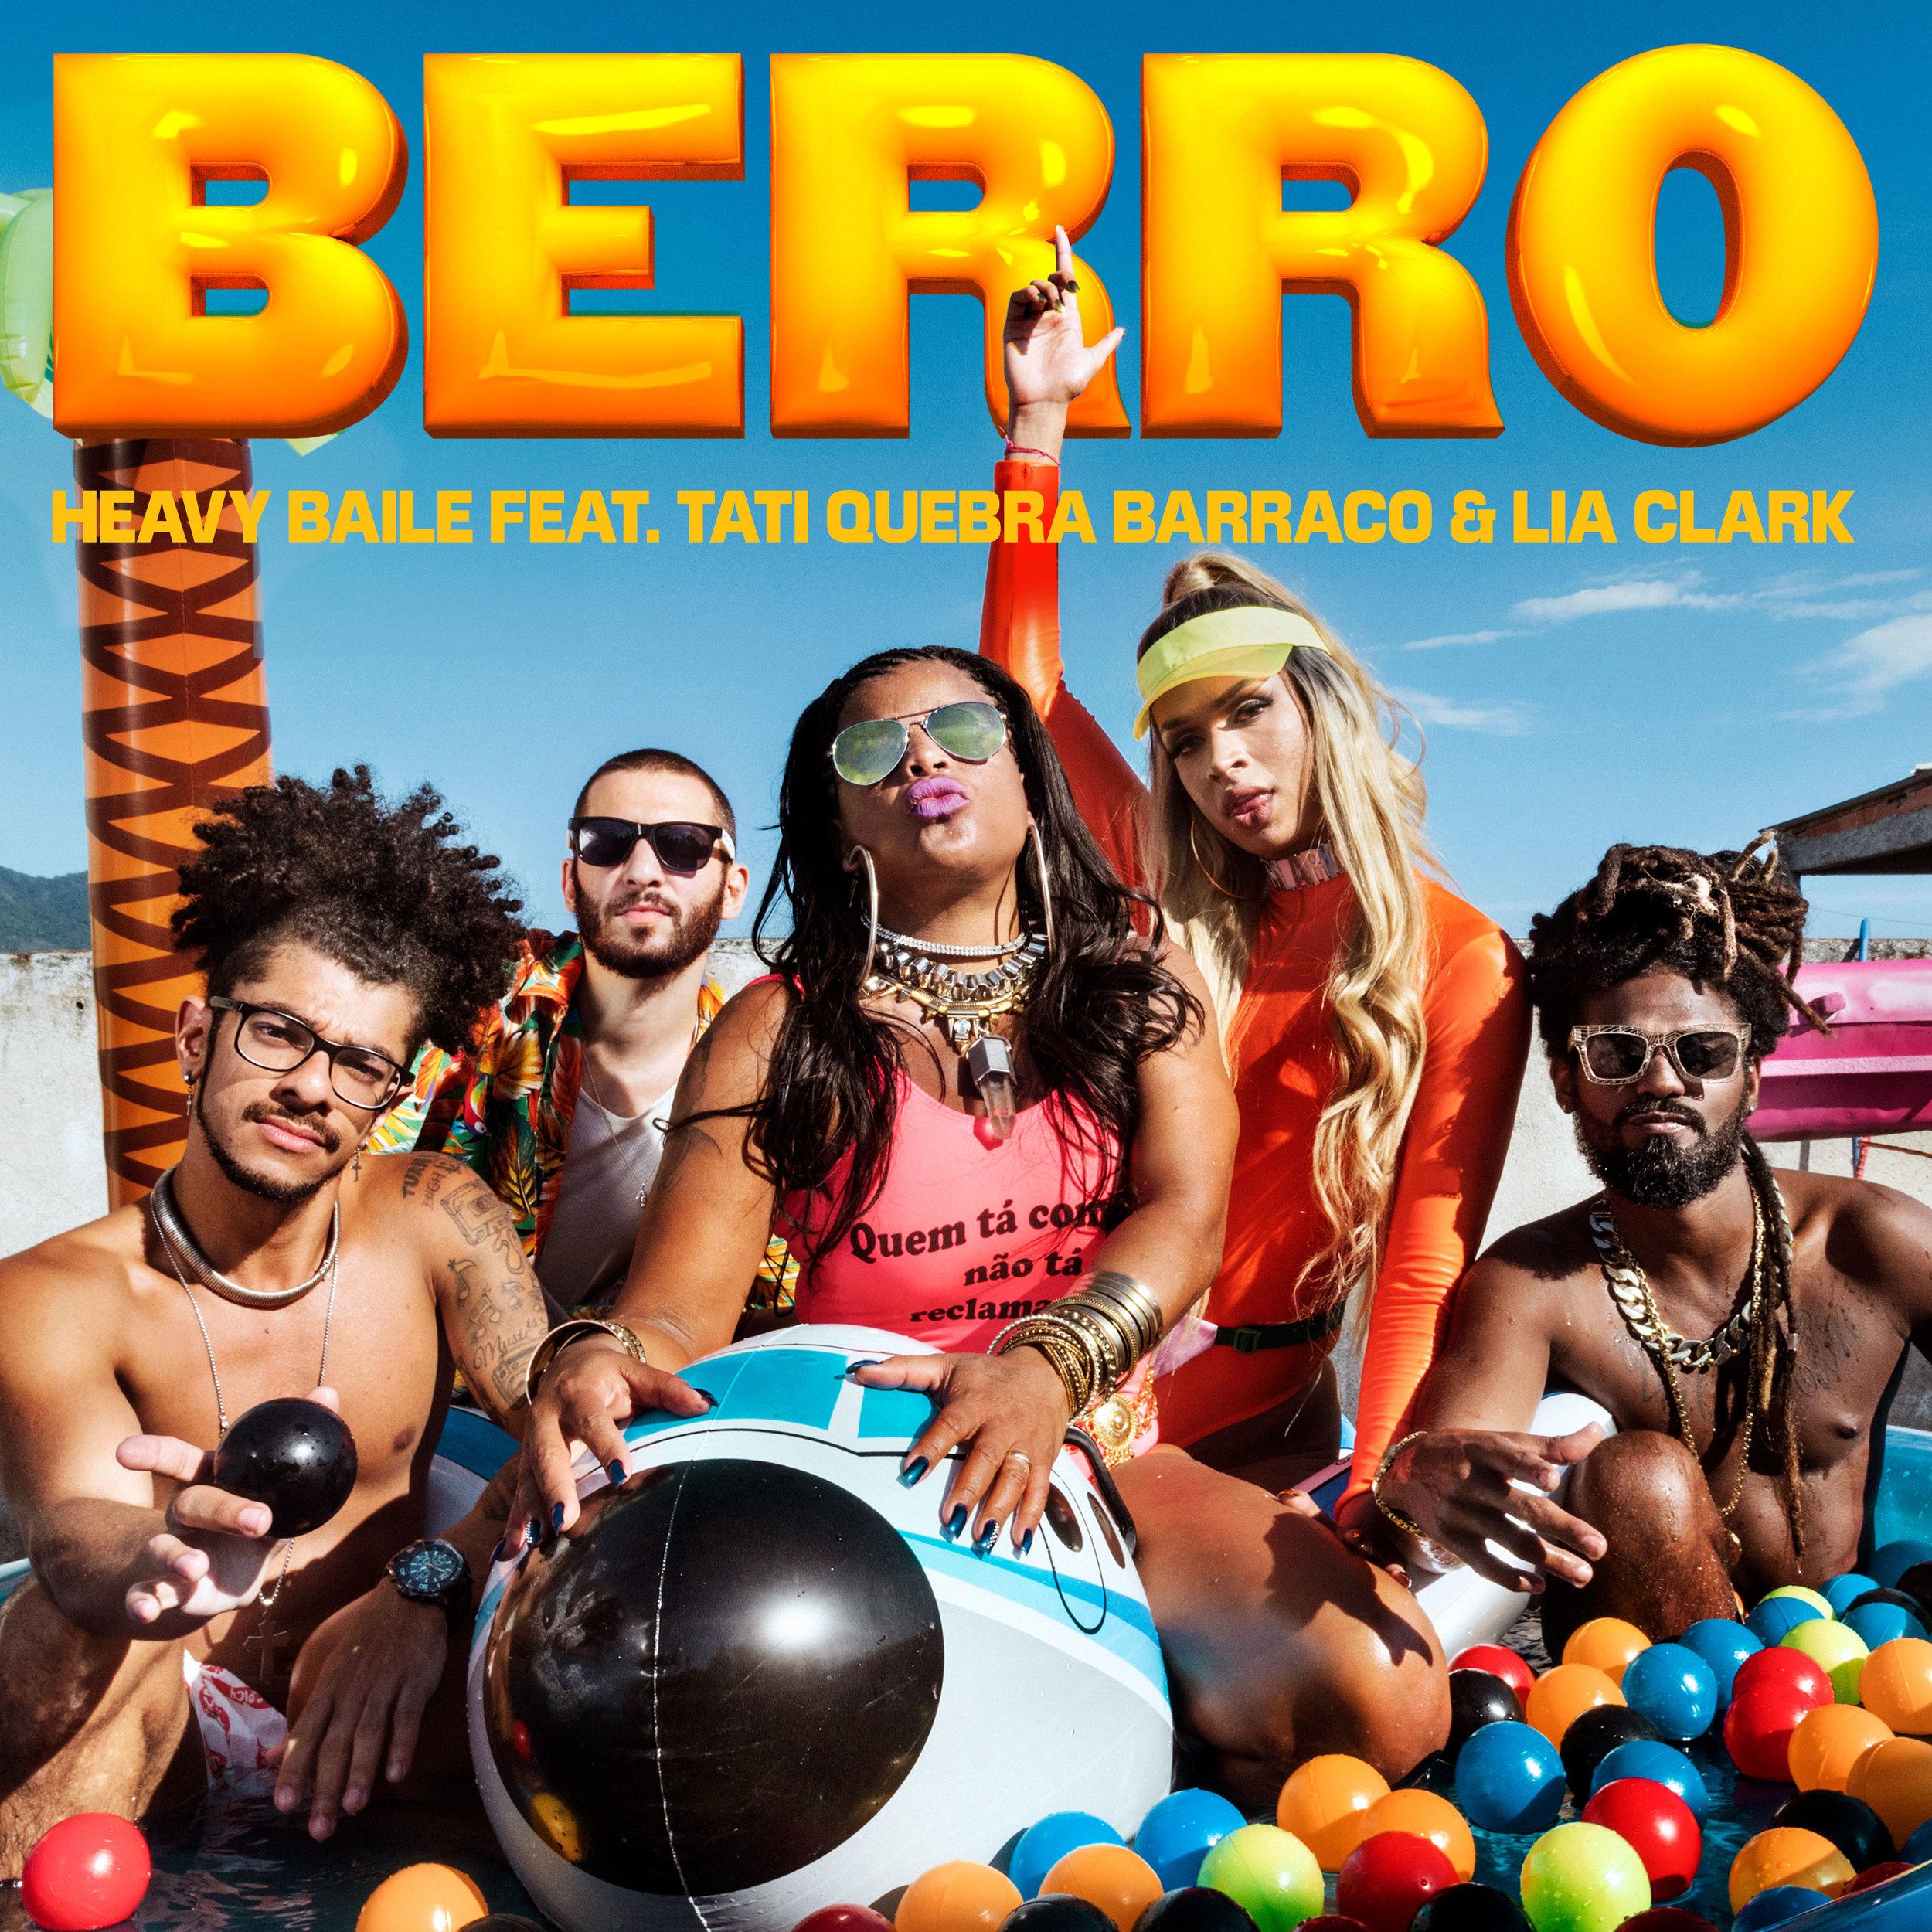 Cover for single BERRO by Heavy Baile feat Tati Quebra Barraco & Lia Clark - shot in City of God Favela. Art by Relâmpago.